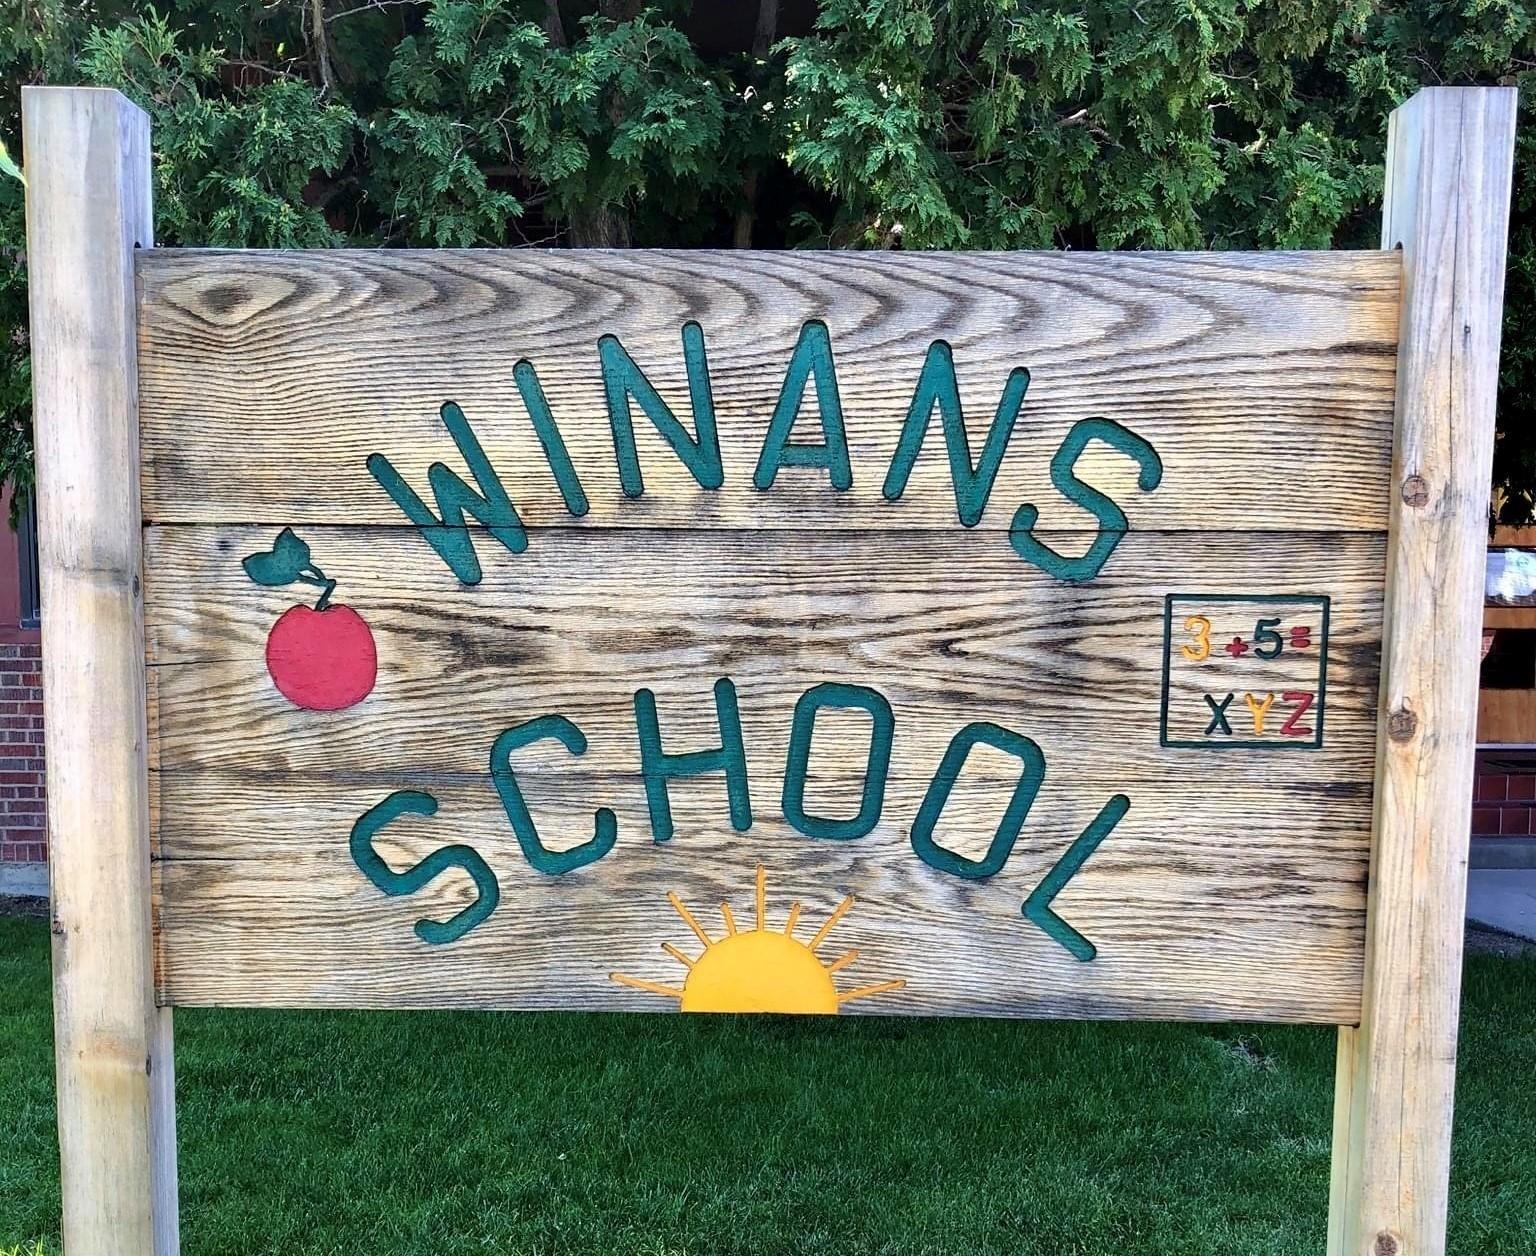 Winans school sign